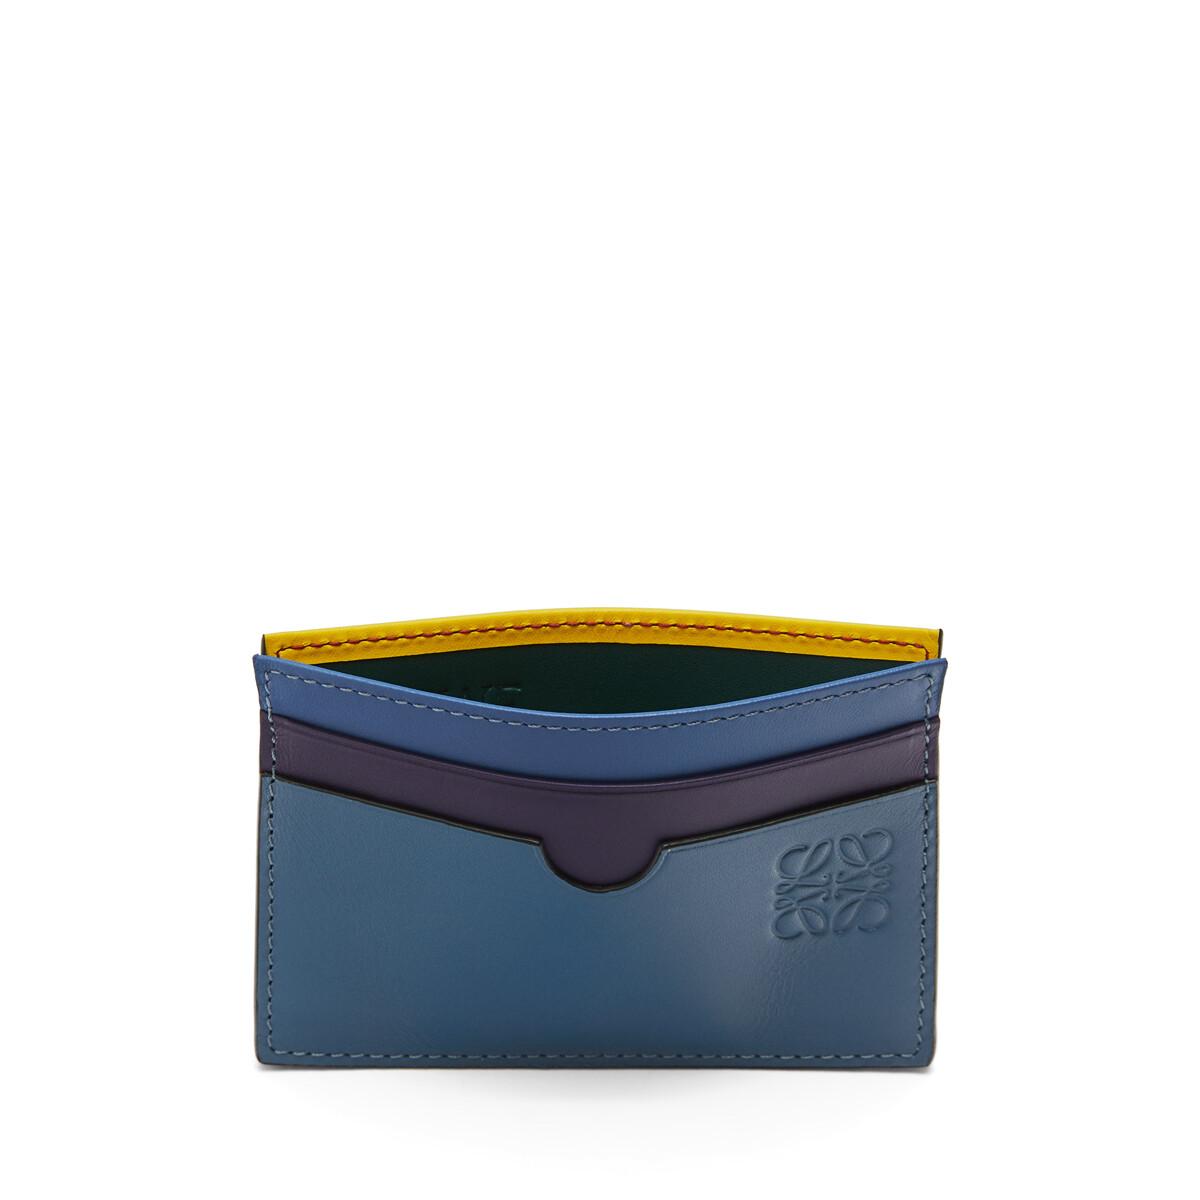 LOEWE Rainbow Plain Cardholder Blue/Multicolor front